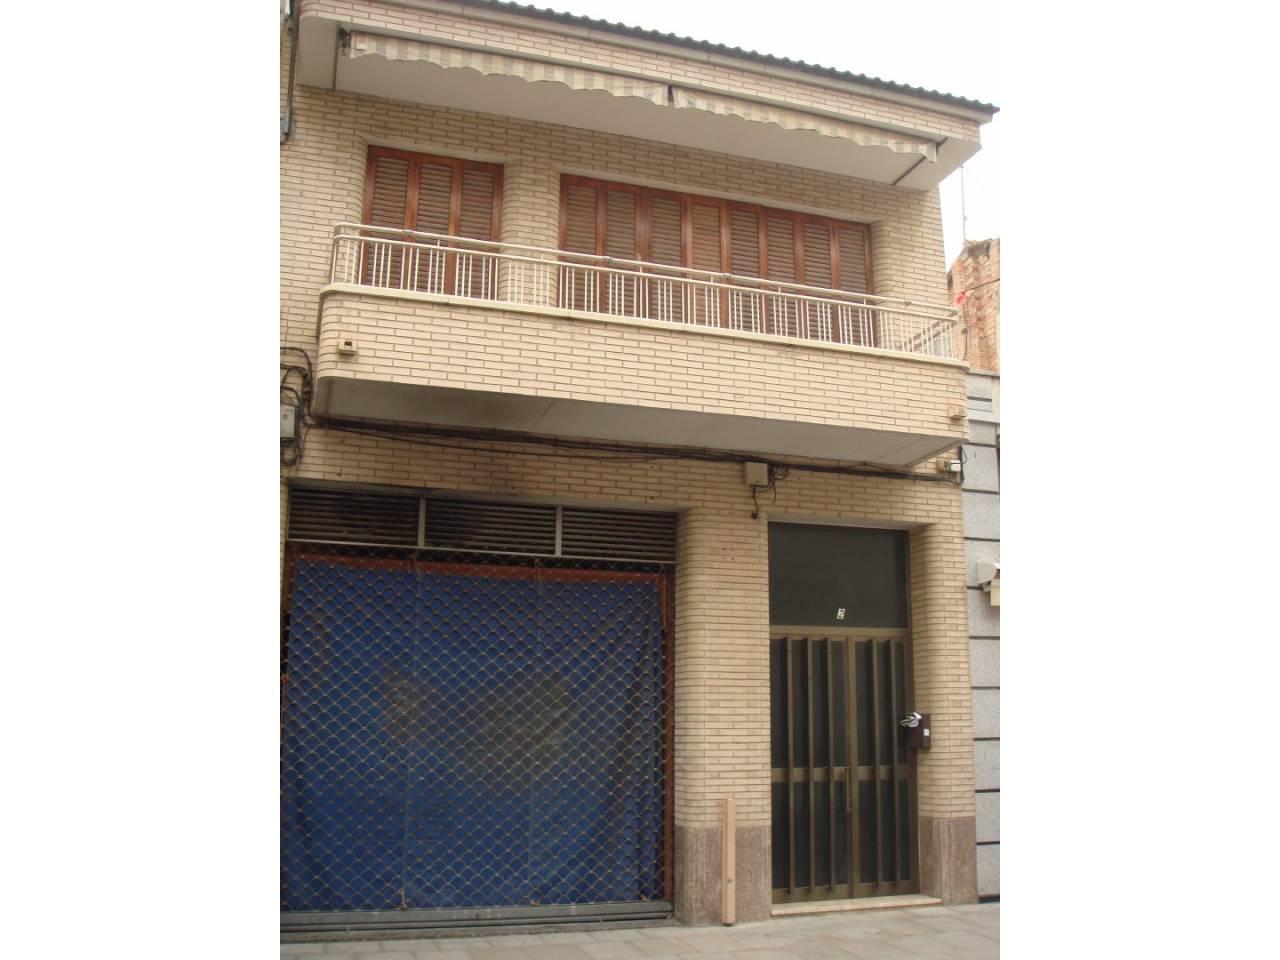 Maison  Calle major. Superf. 180 m²,  4 habitaciones (3 dobles,  1 individual),  1 ba